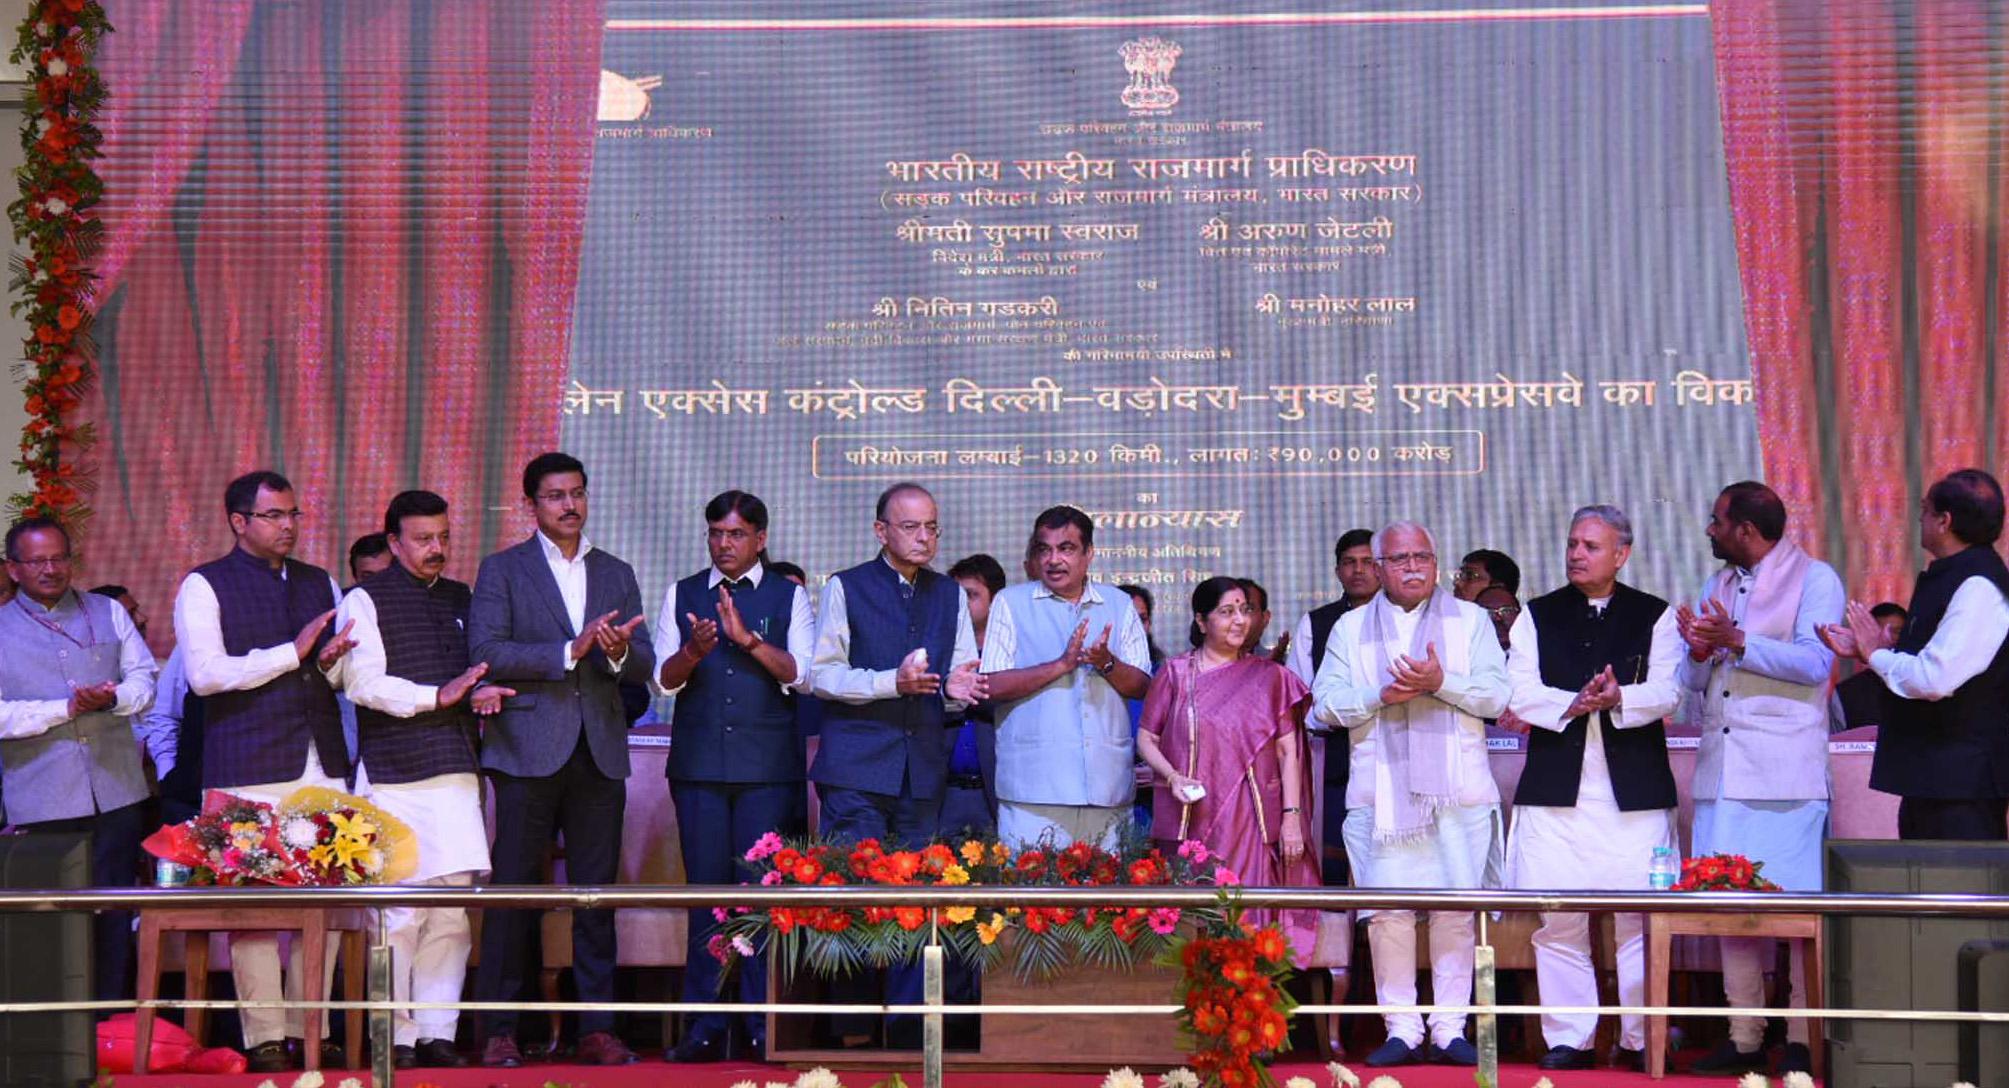 Swaraj, Jaitley and Gadkari lay foundation stones for Dwarka Expressway, Delhi-Mumbai Expressway